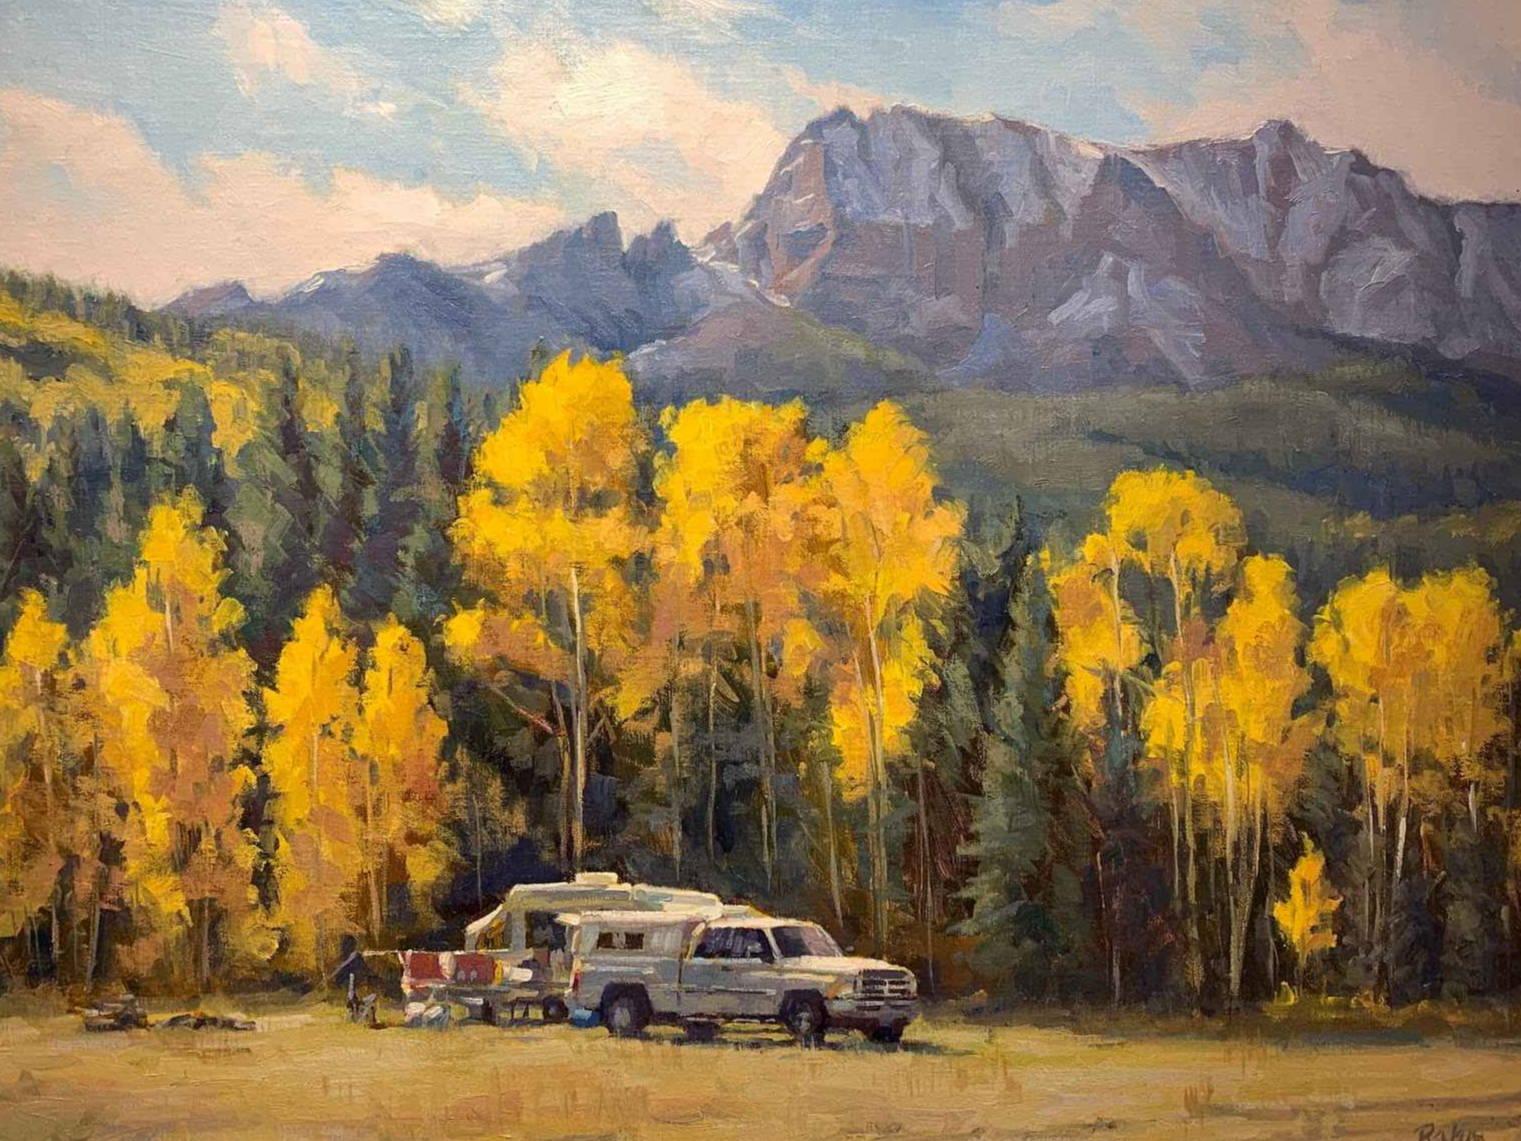 Robert Rohm. Bob Rohm. Landscape Paintings. Sorrel Sky Gallery. Santa Fe Art Gallery. Maura Allen. Edward Aldrich. Kevin Red Star. Ray Hare. Durango Art Gallery.